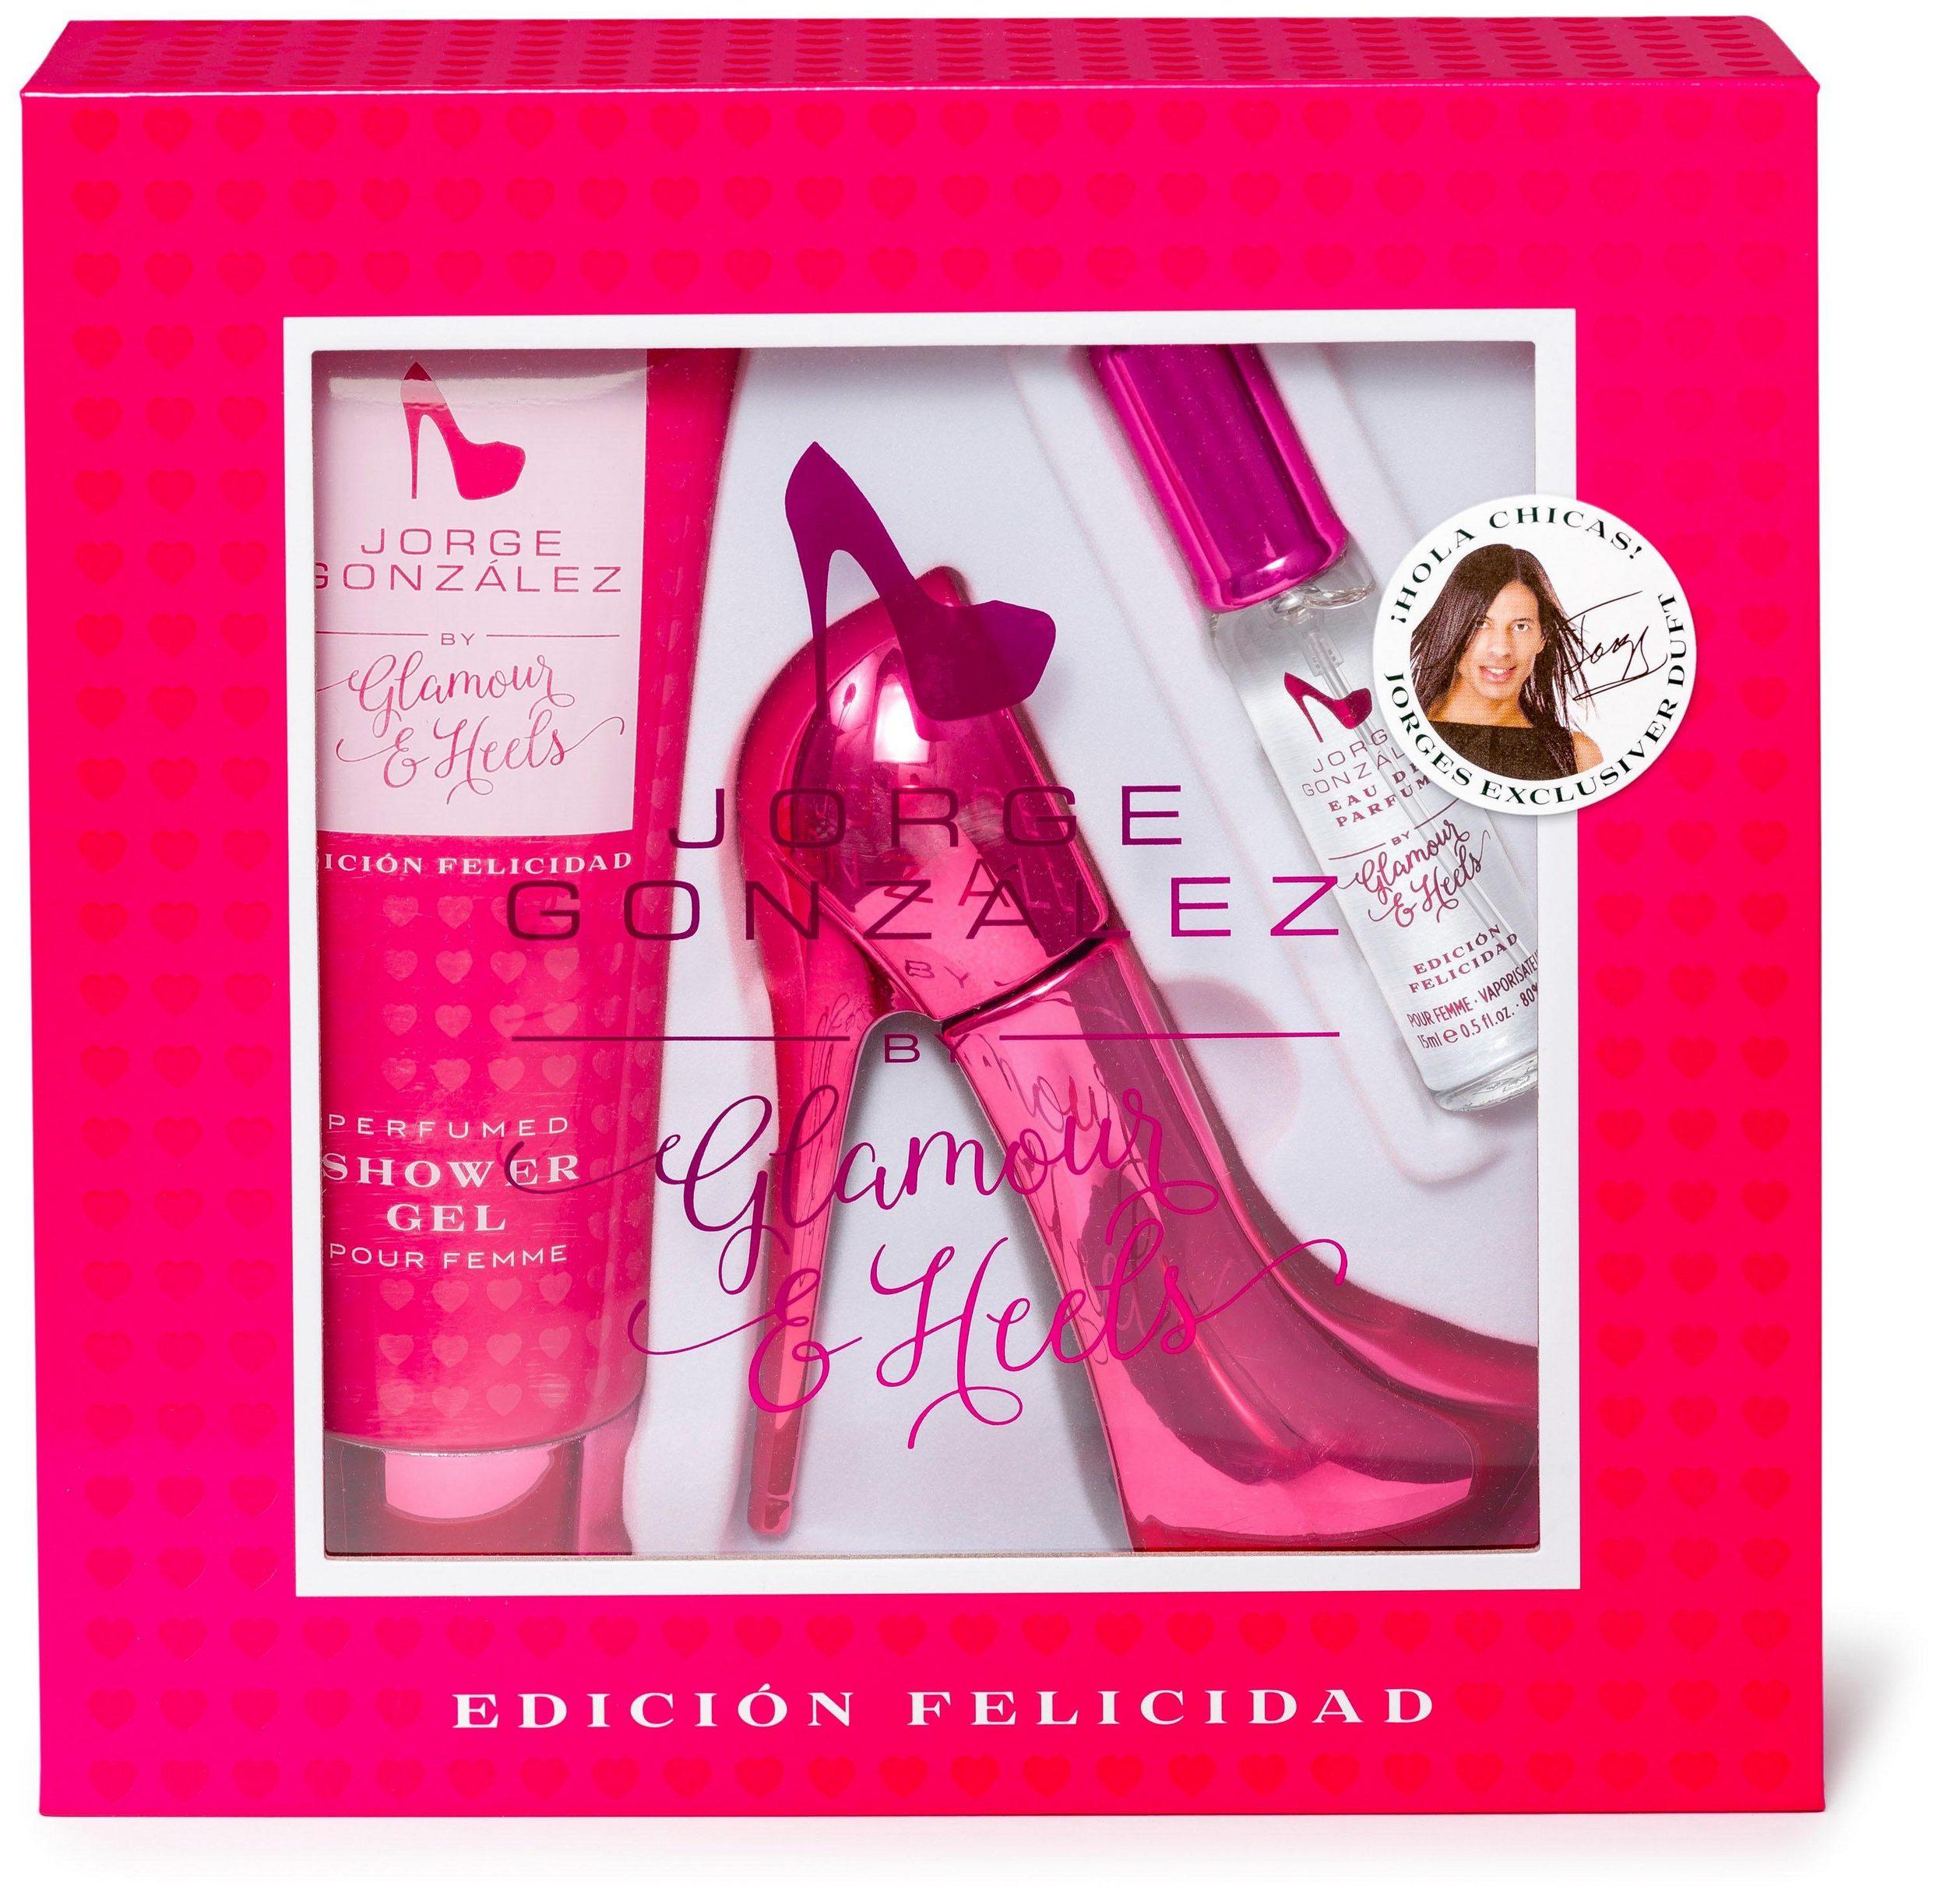 Glamour & Heels Duft-Set »JORGE GONZALEZ pink Felicidad«, 3-tlg